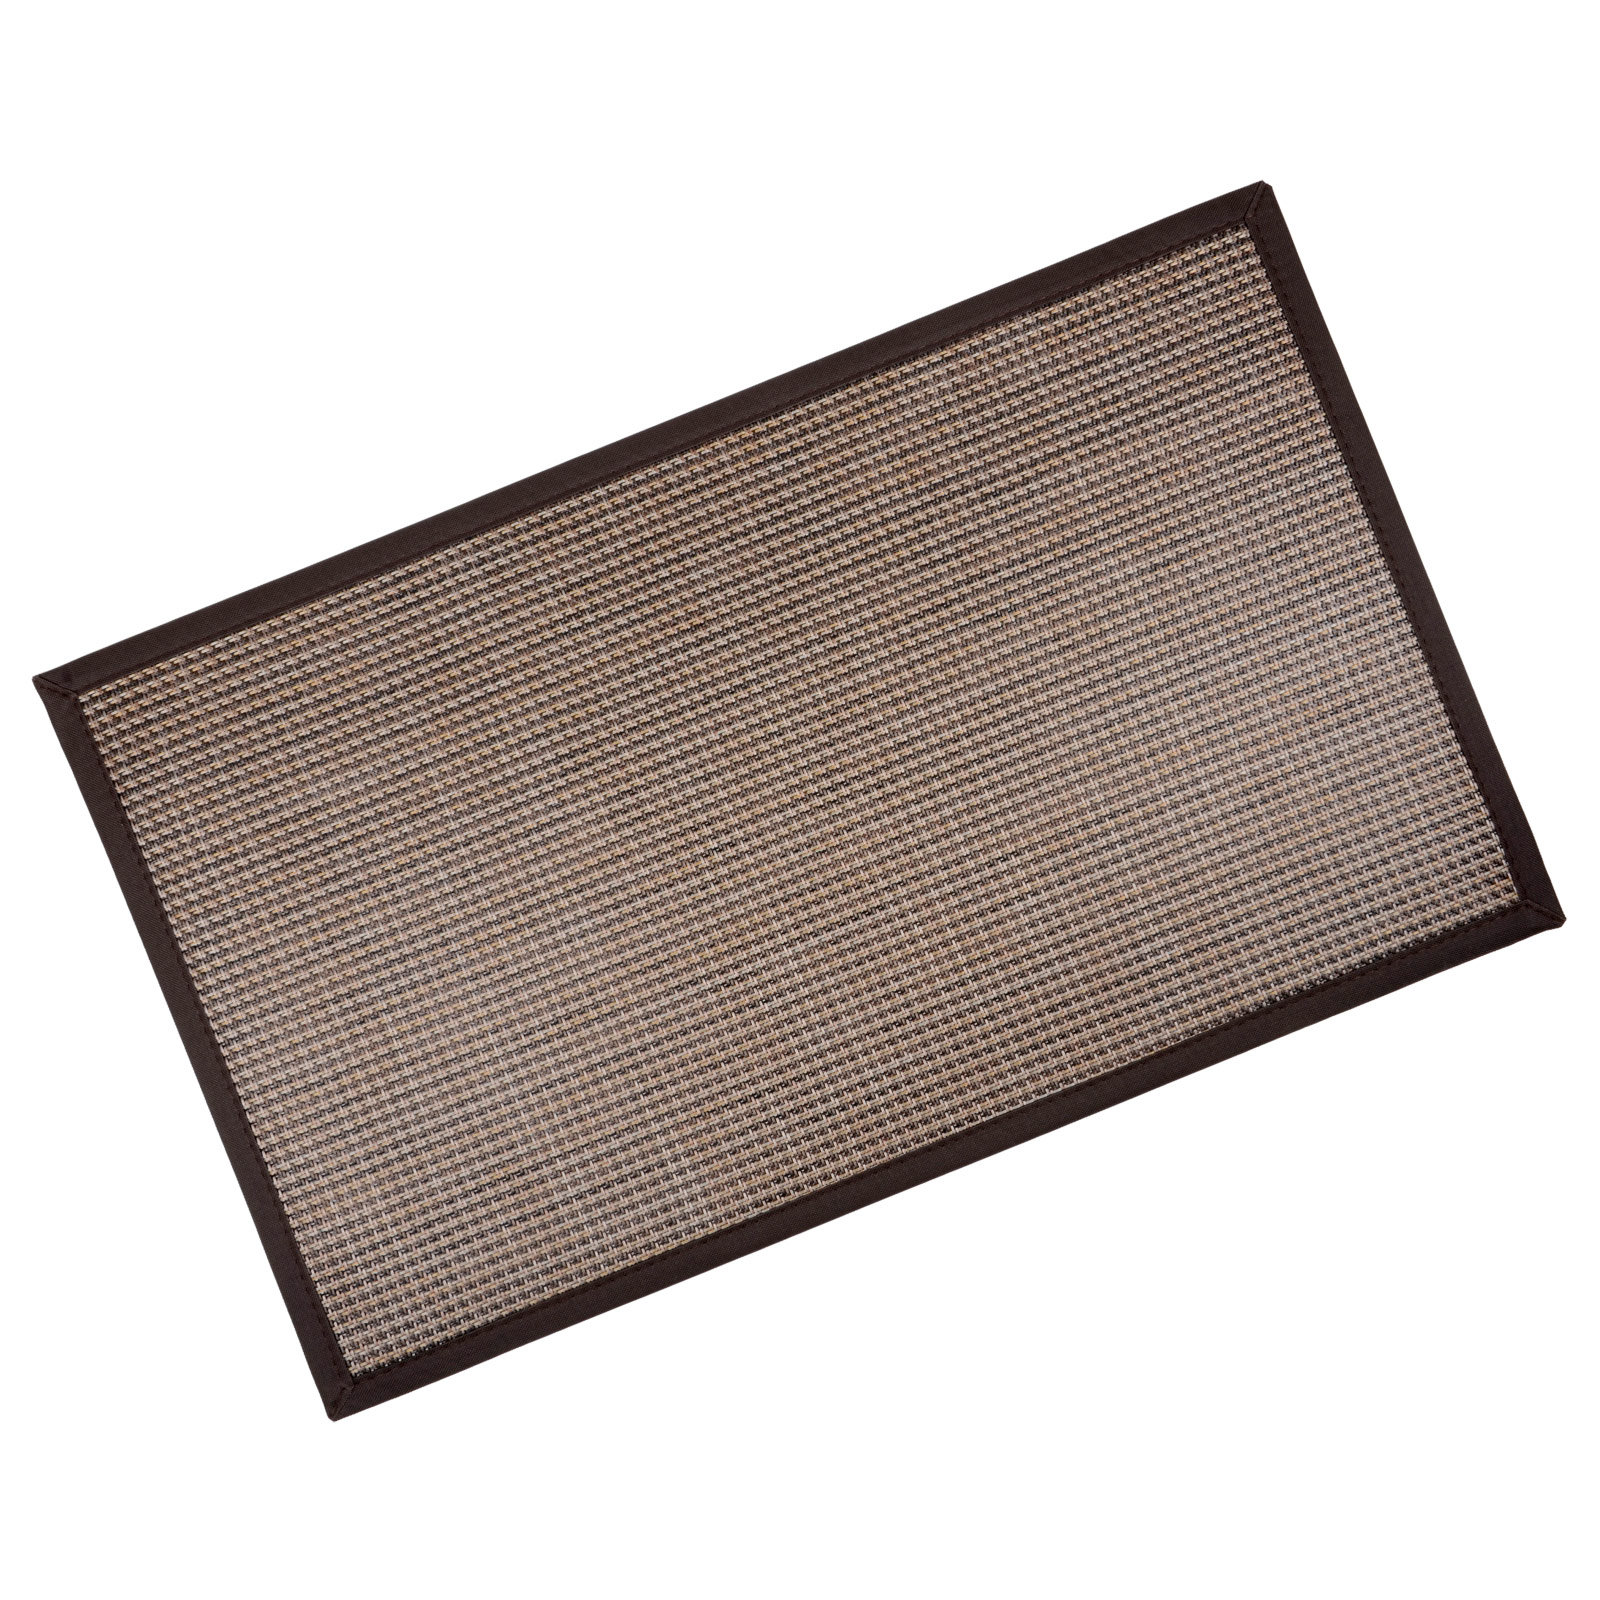 Kitchen floor mats large kitchen floor mat large size 76 x 46cm sale kitchen floor mat - Professional kitchen floor mats ...